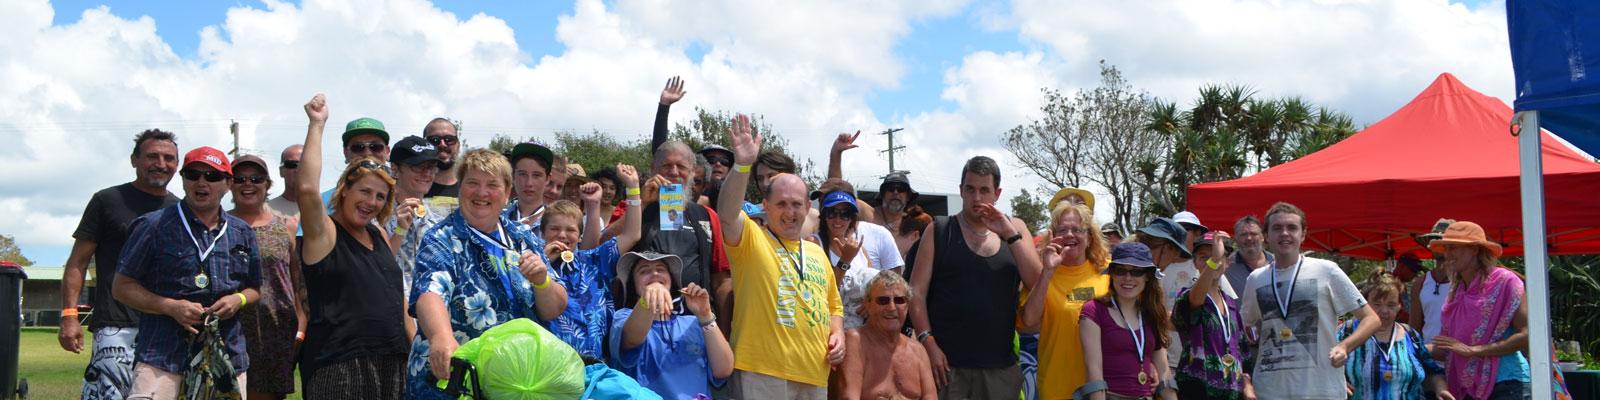 Wooli-Beach-Hotel-Motel-Community